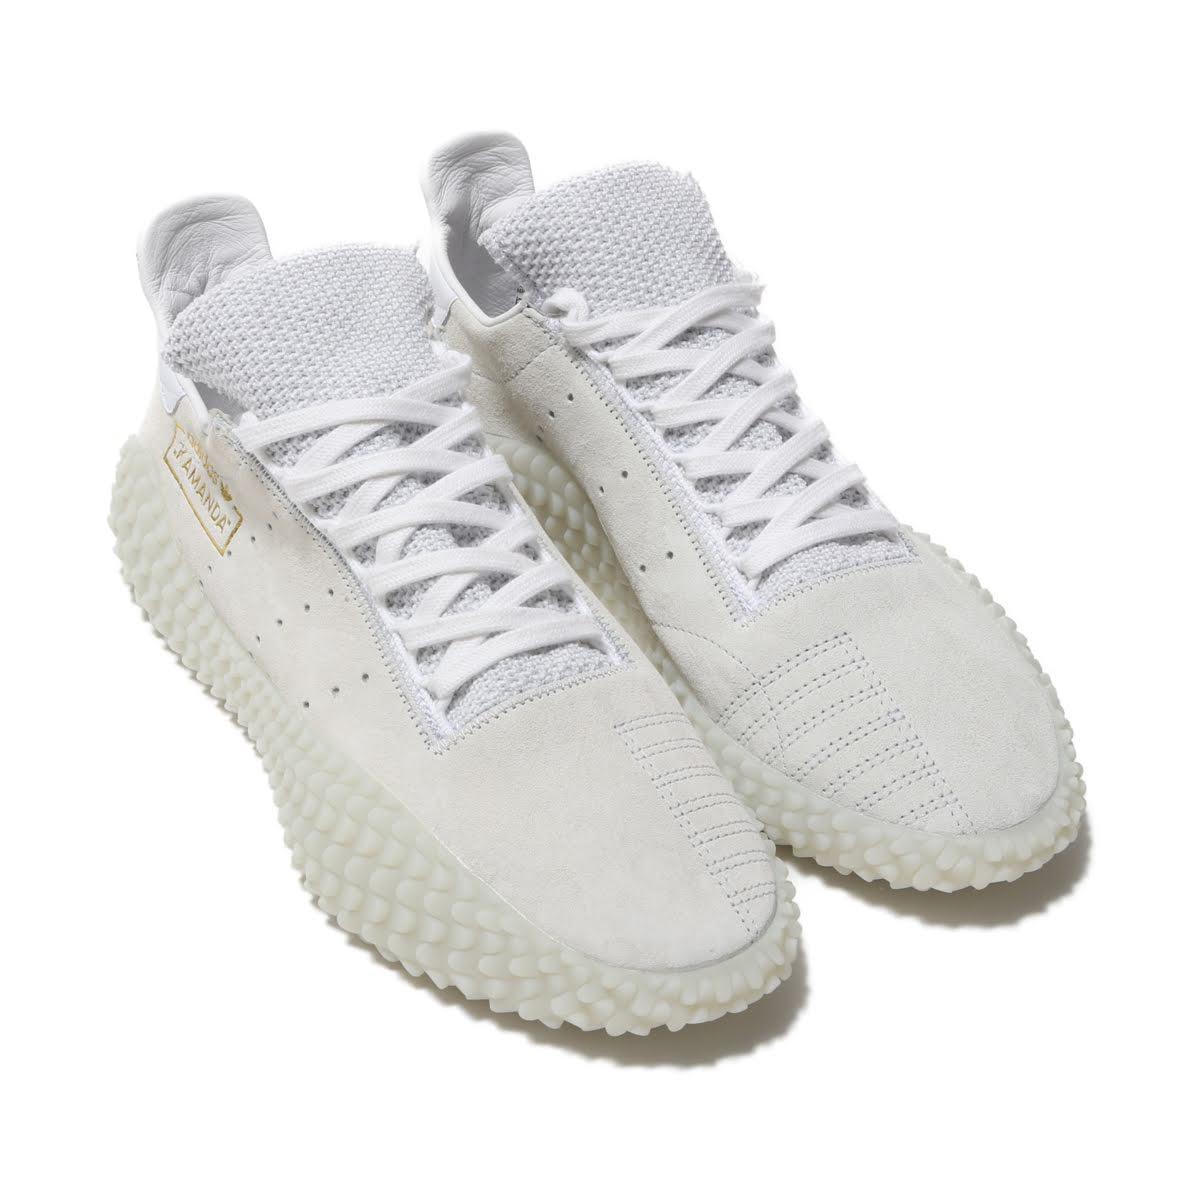 adidas Originals KAMANDA01 (アディダスオリジナルス カマンダ01)CRYSTAL WHITE/FTWR WHITE/GOLD MET.【メンズ スニーカー】19SS-I